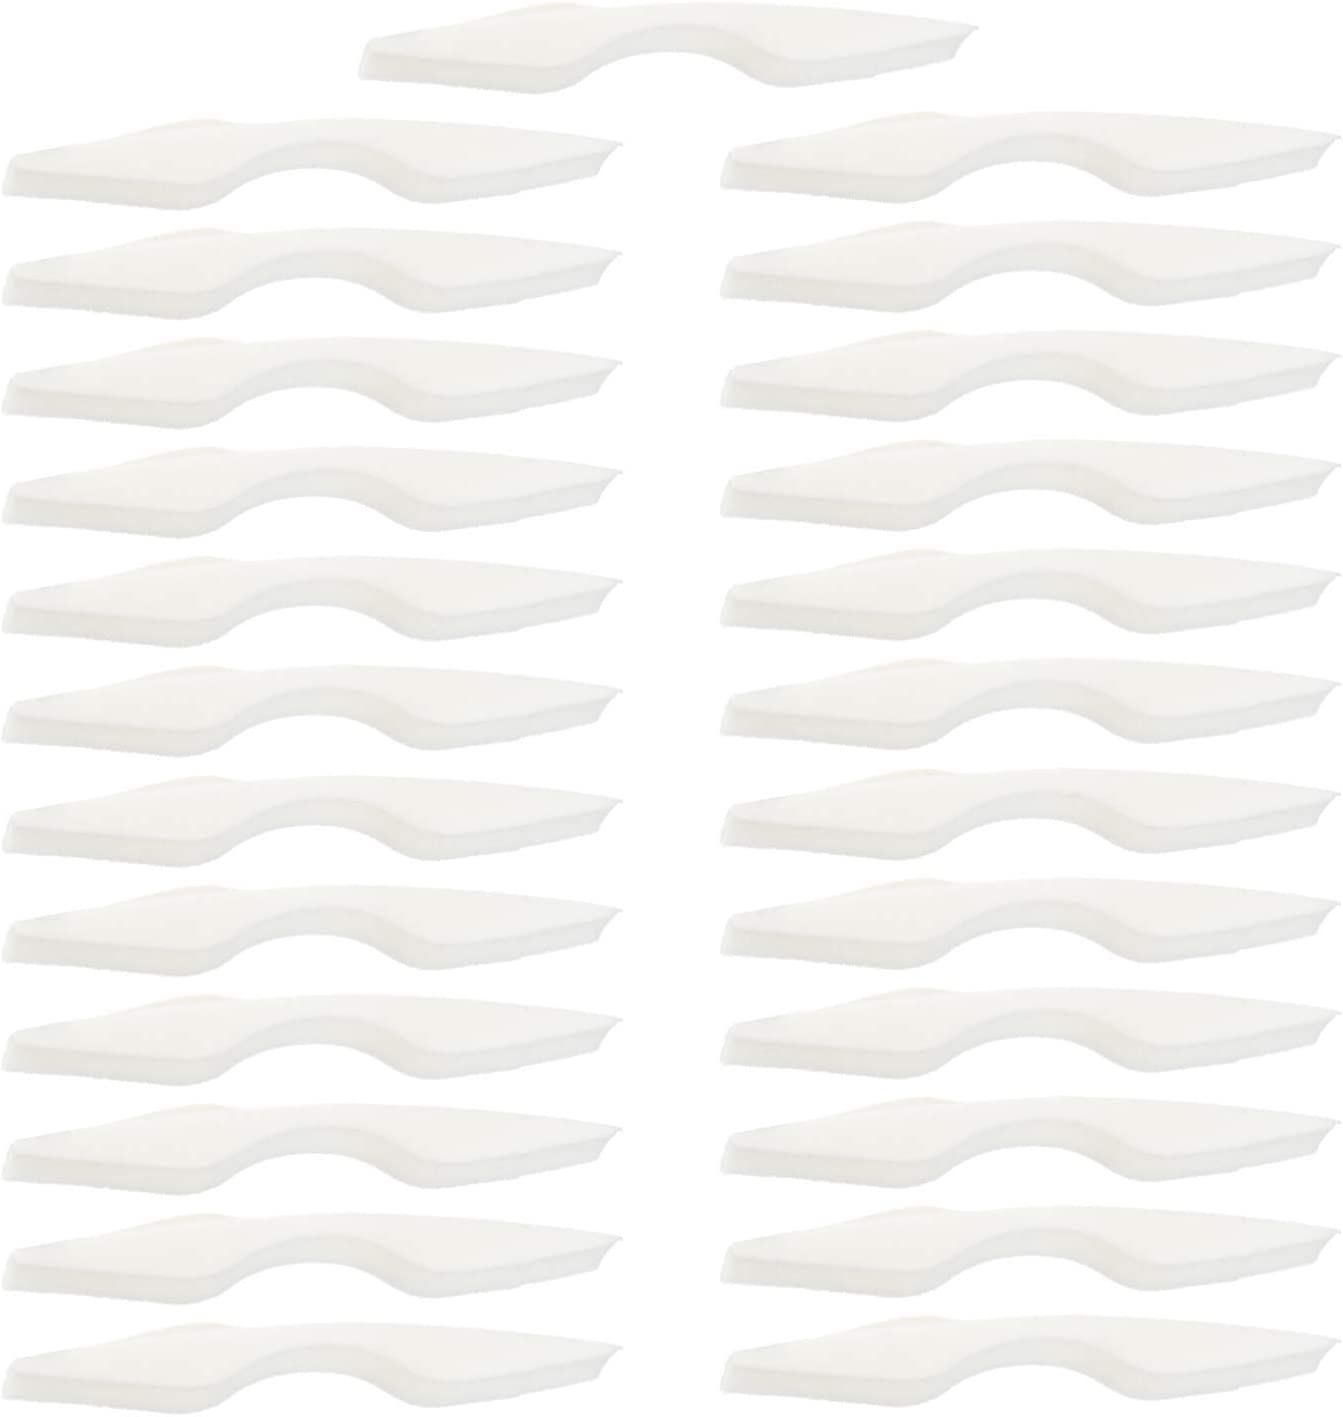 ARTIBETTER 50pcs Memory Anti Fog Self Prote Adhesive All Las Vegas Mall items free shipping Nose Bridge